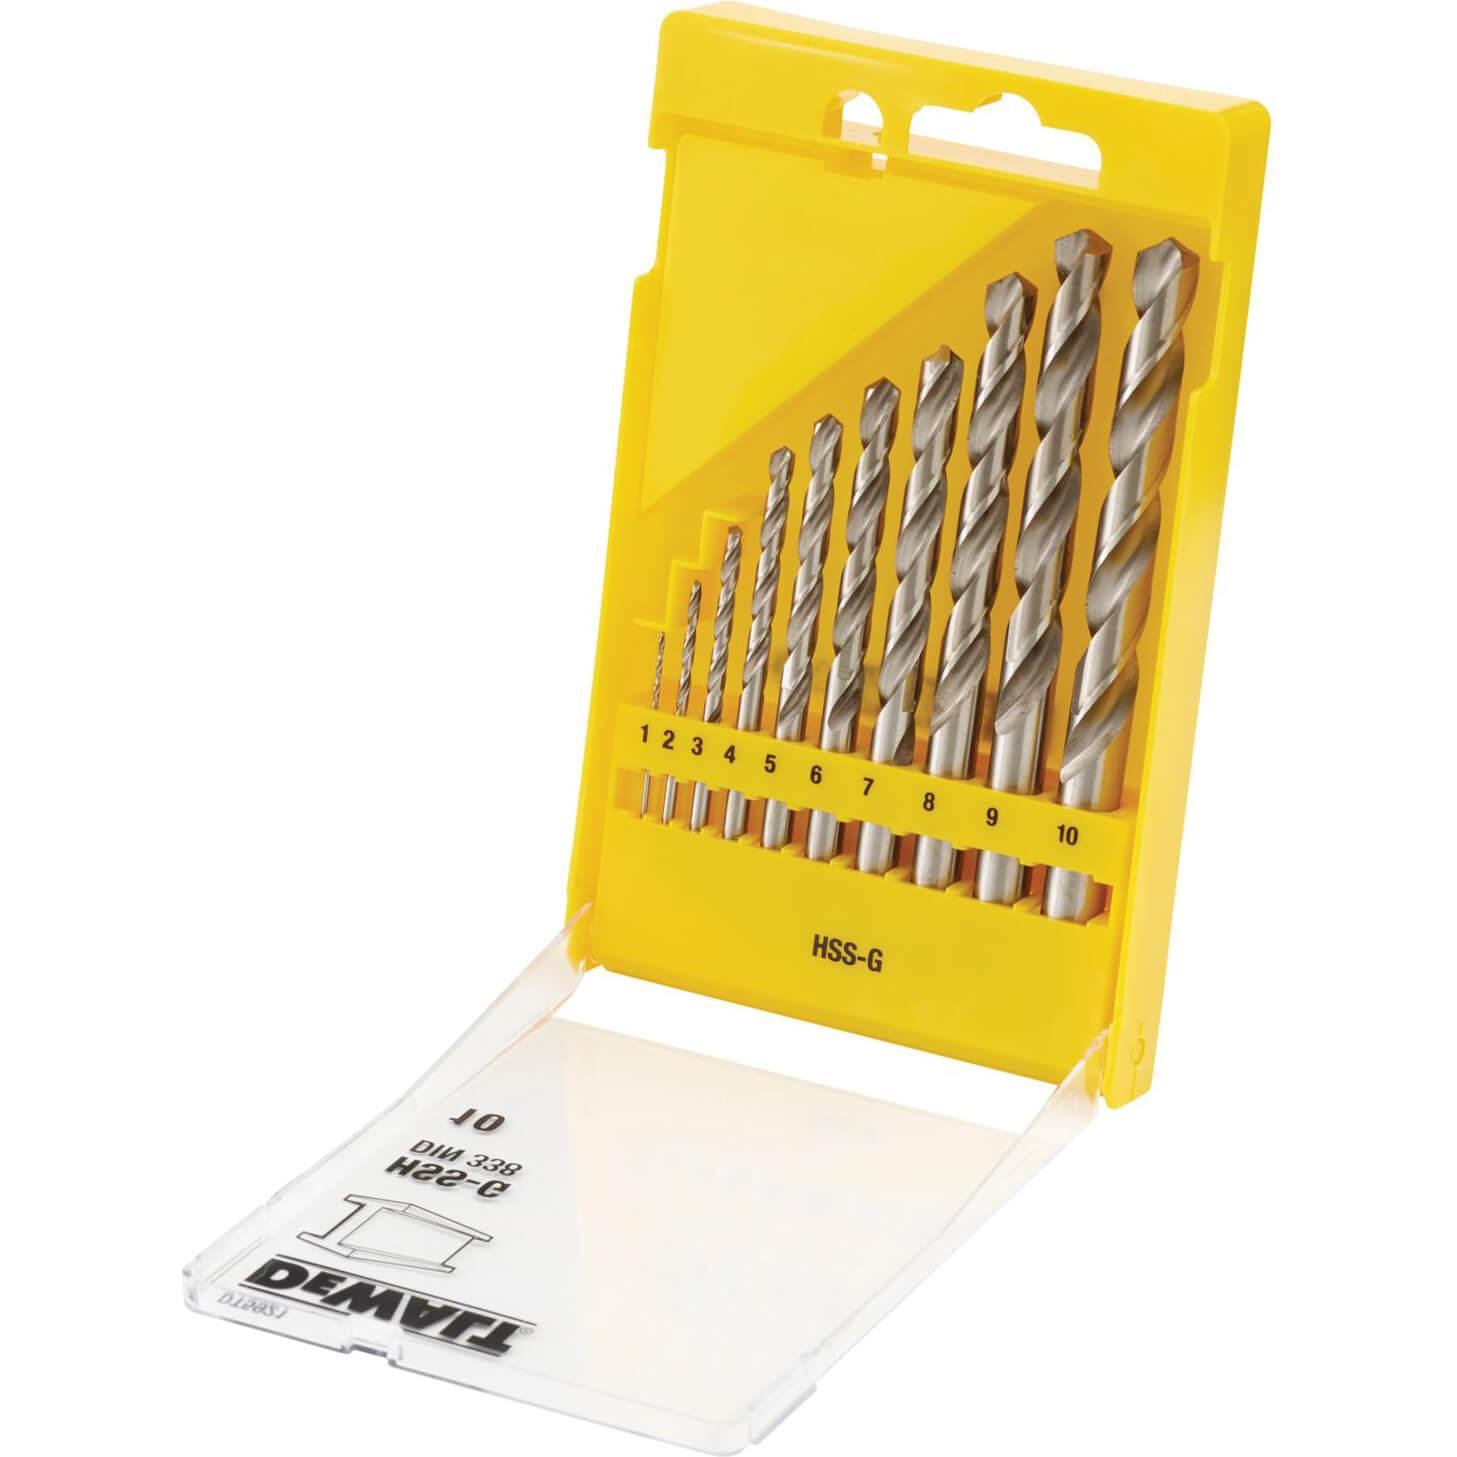 DeWalt 10 Piece HSS-G Metal Drill Bit Set 1 - 10mm